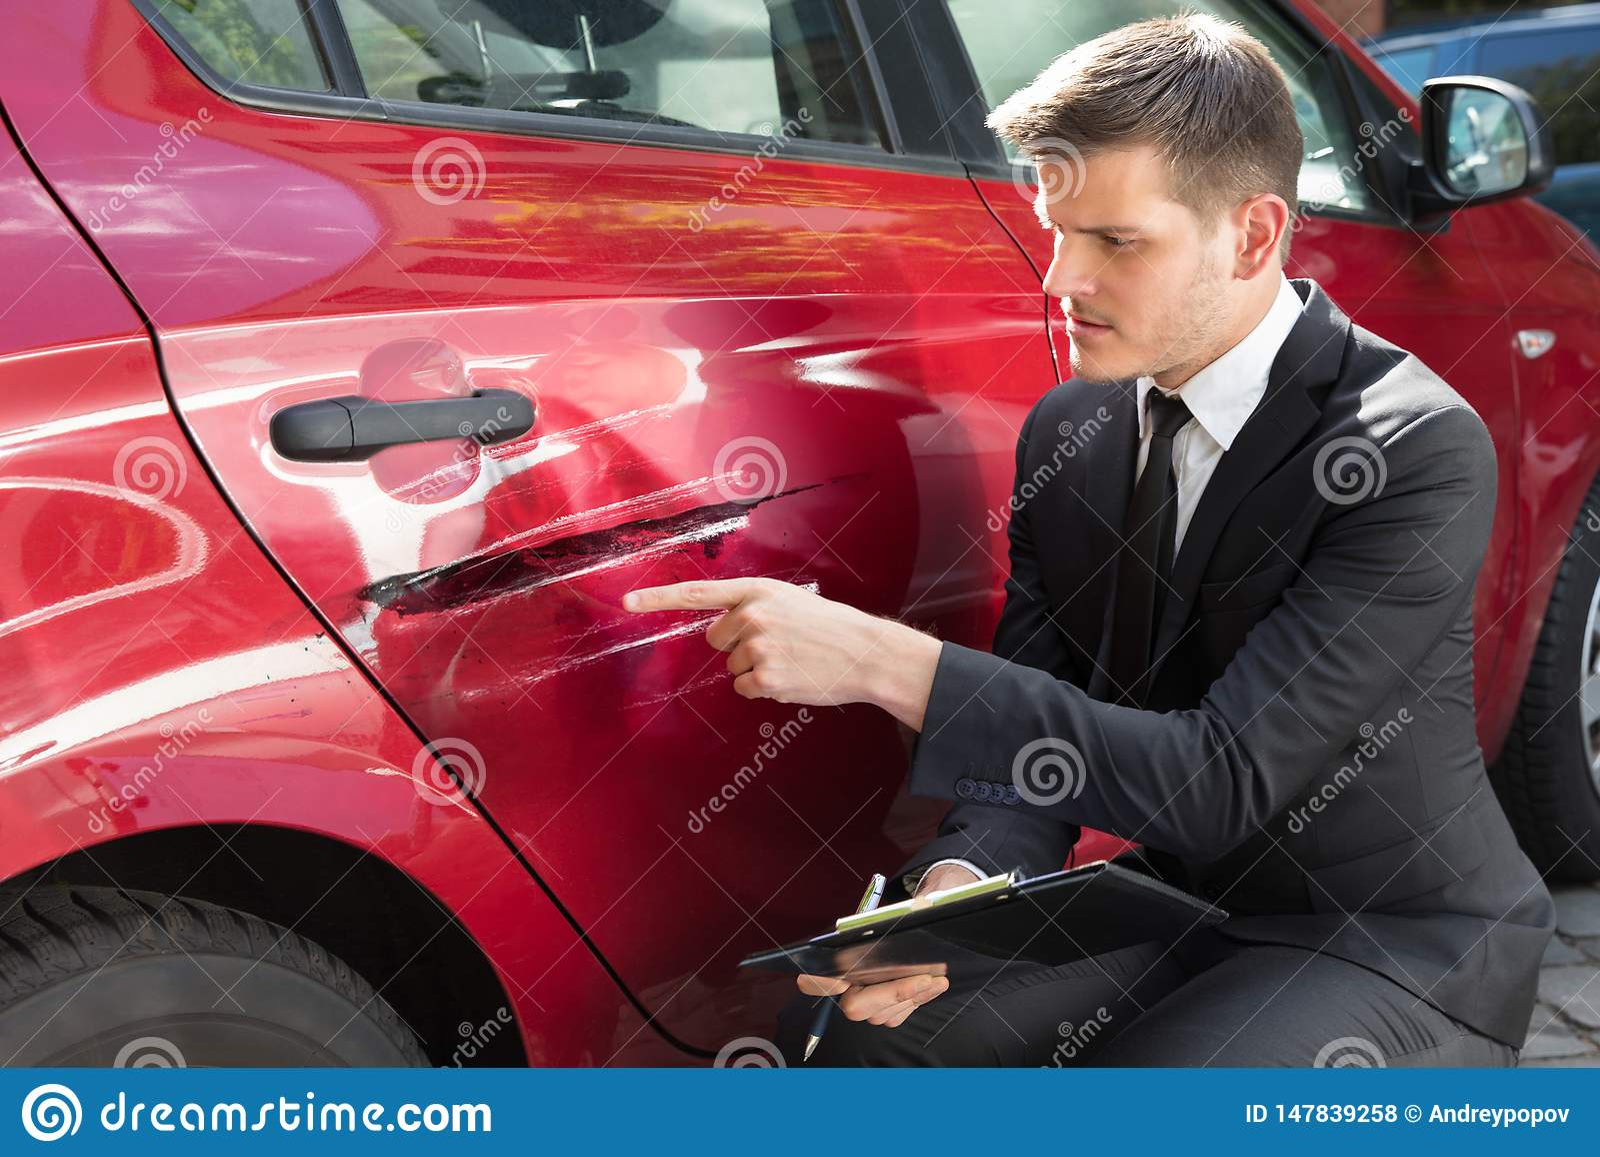 Formulario de relleno del seguro del hombre cerca del coche da?ado